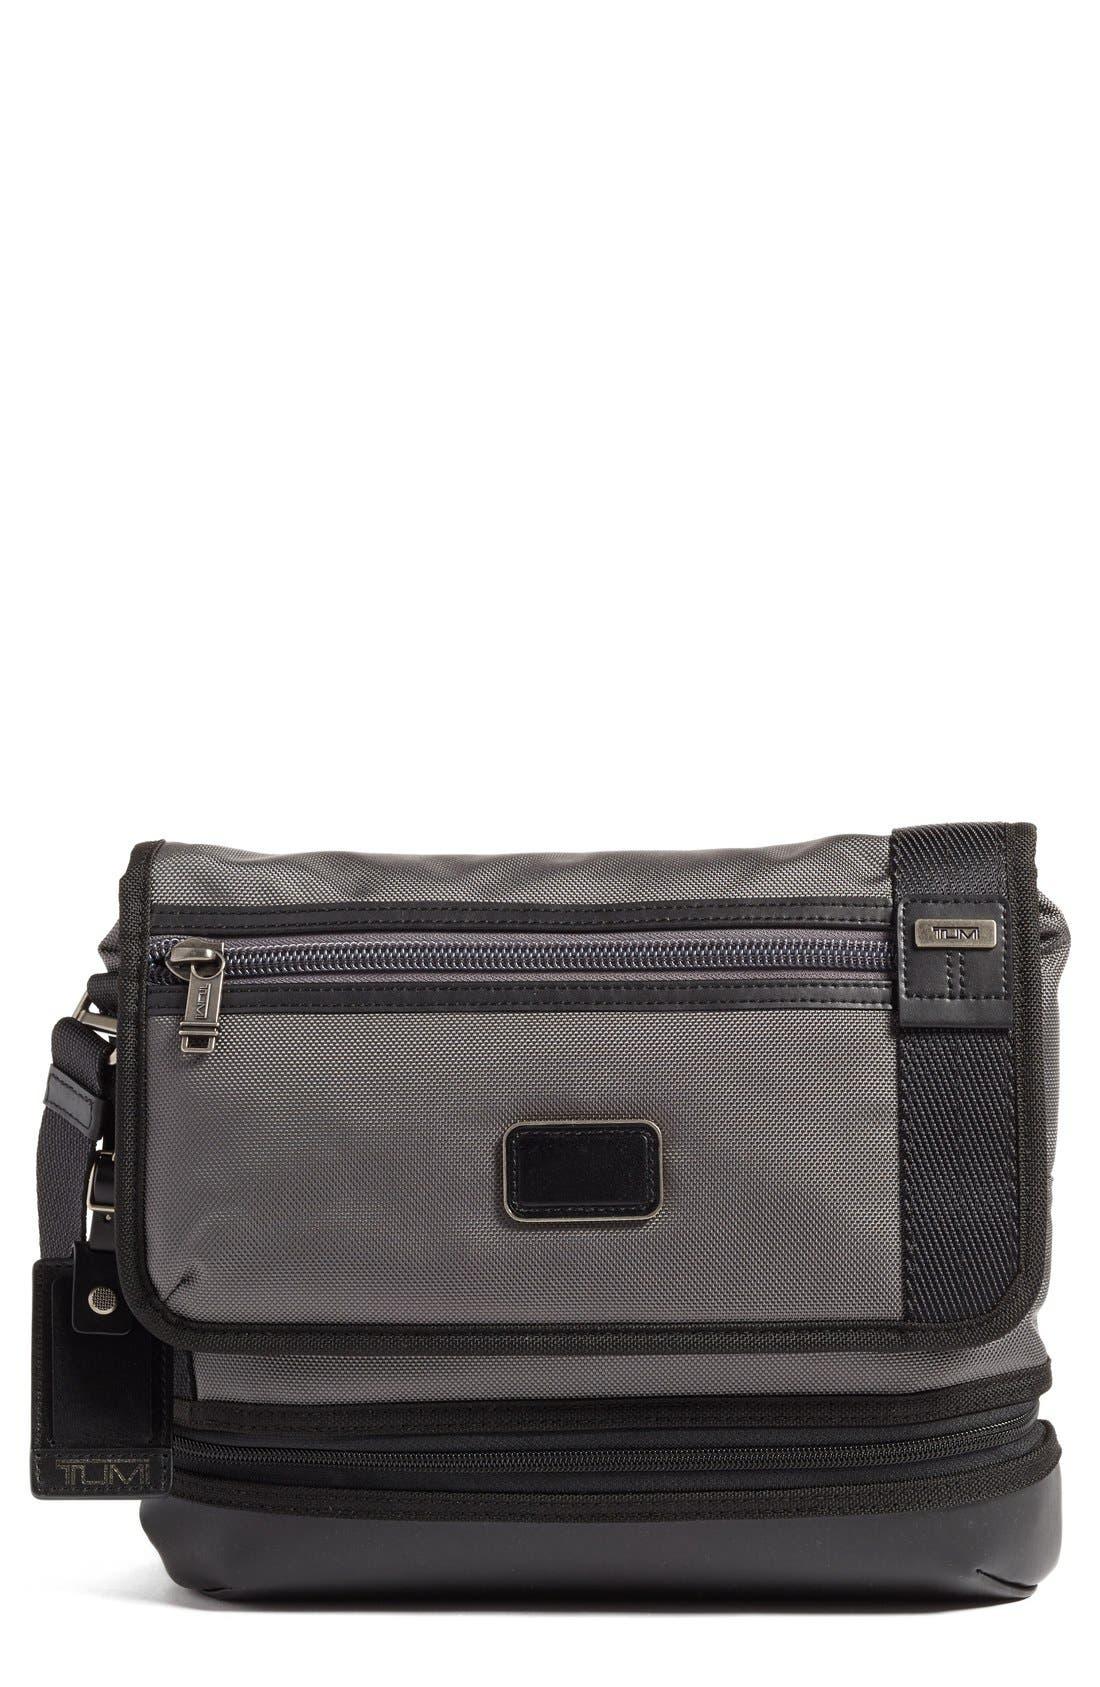 Main Image - Tumi Alpha Bravo - Beale Crossbody Bag